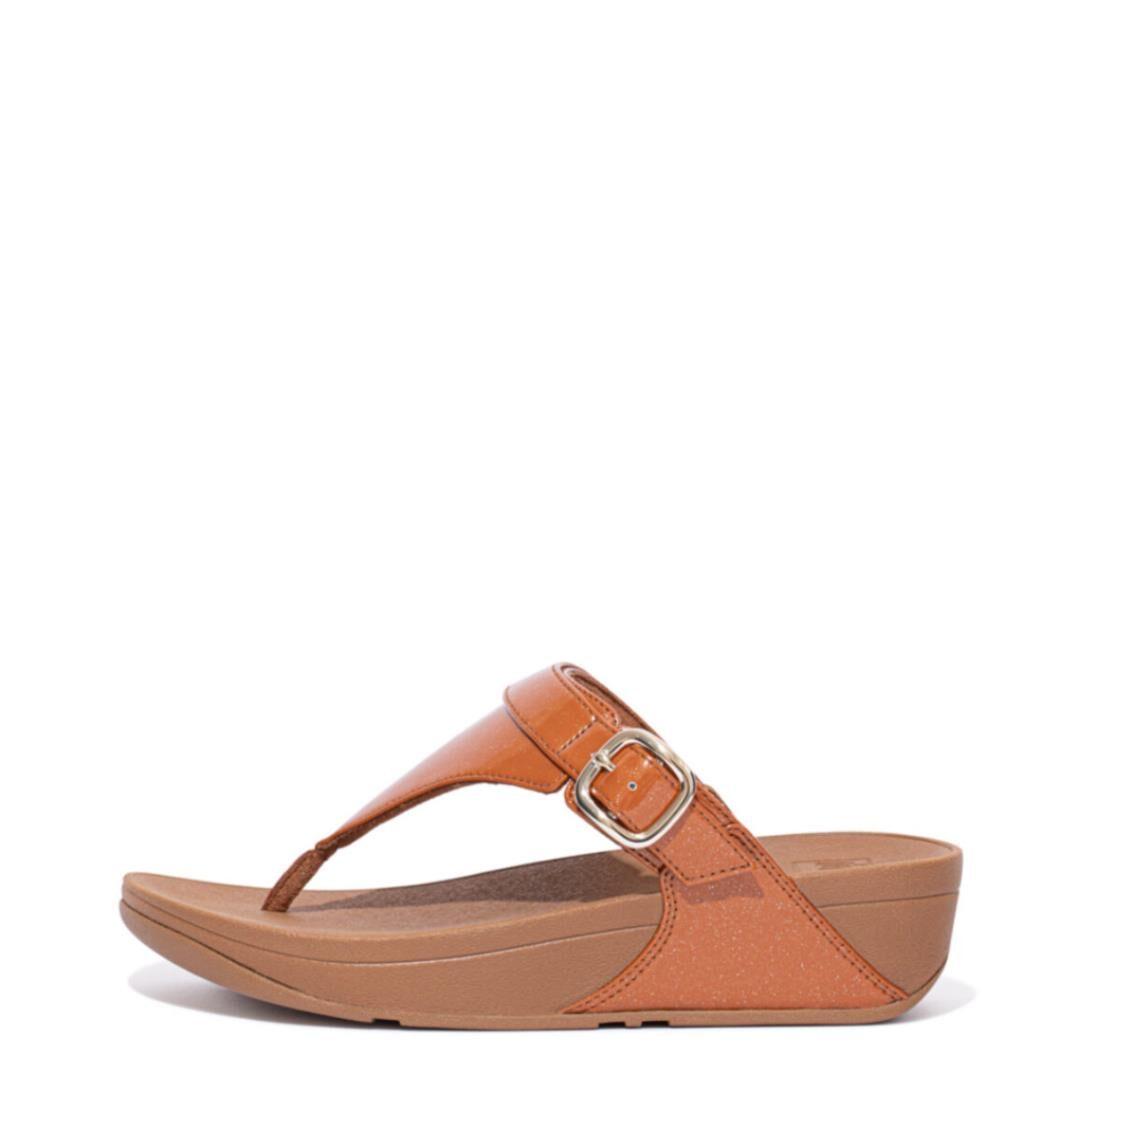 Fitflop Lulu Glitter Adjustable Toe-post Sandals Clay Brown EC9-886